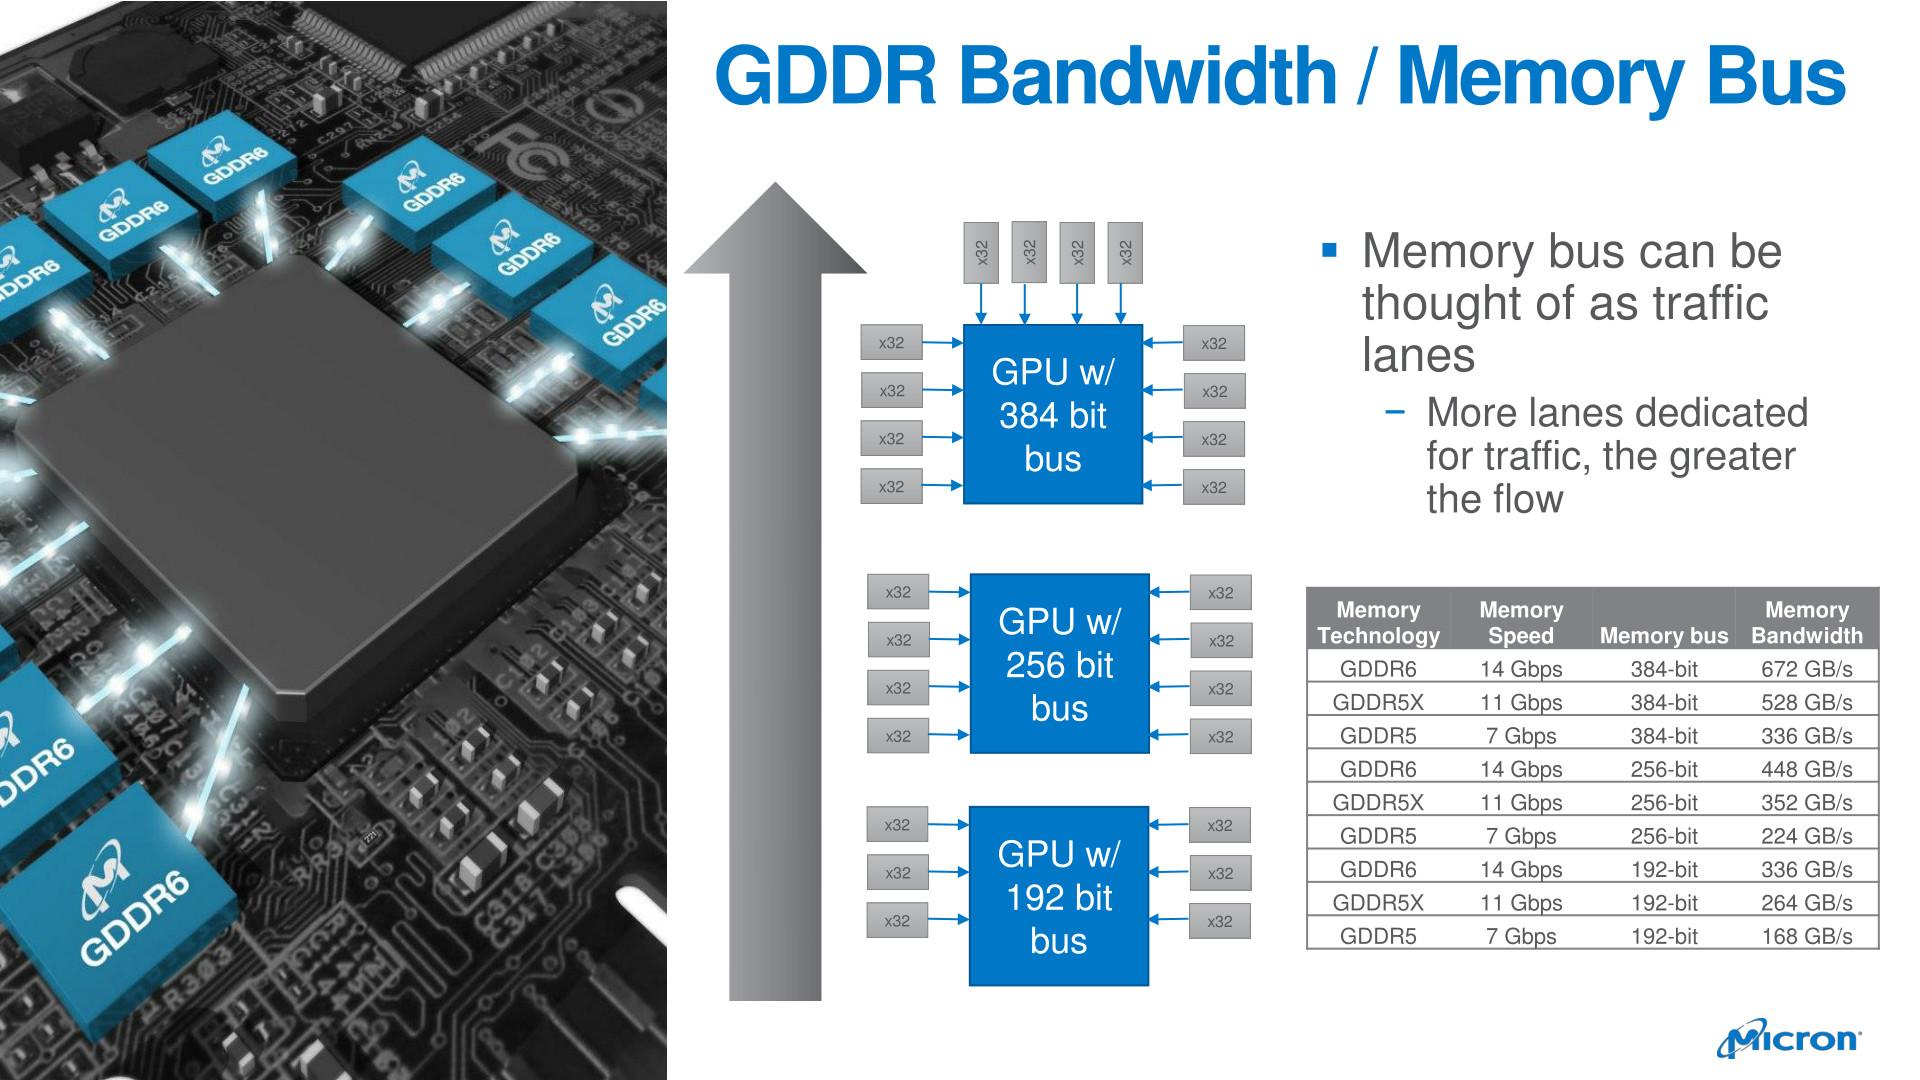 Micron Announces Its Initial Launch Partner Status for NVIDIA RTX 20 Series GDDR6 Implementation